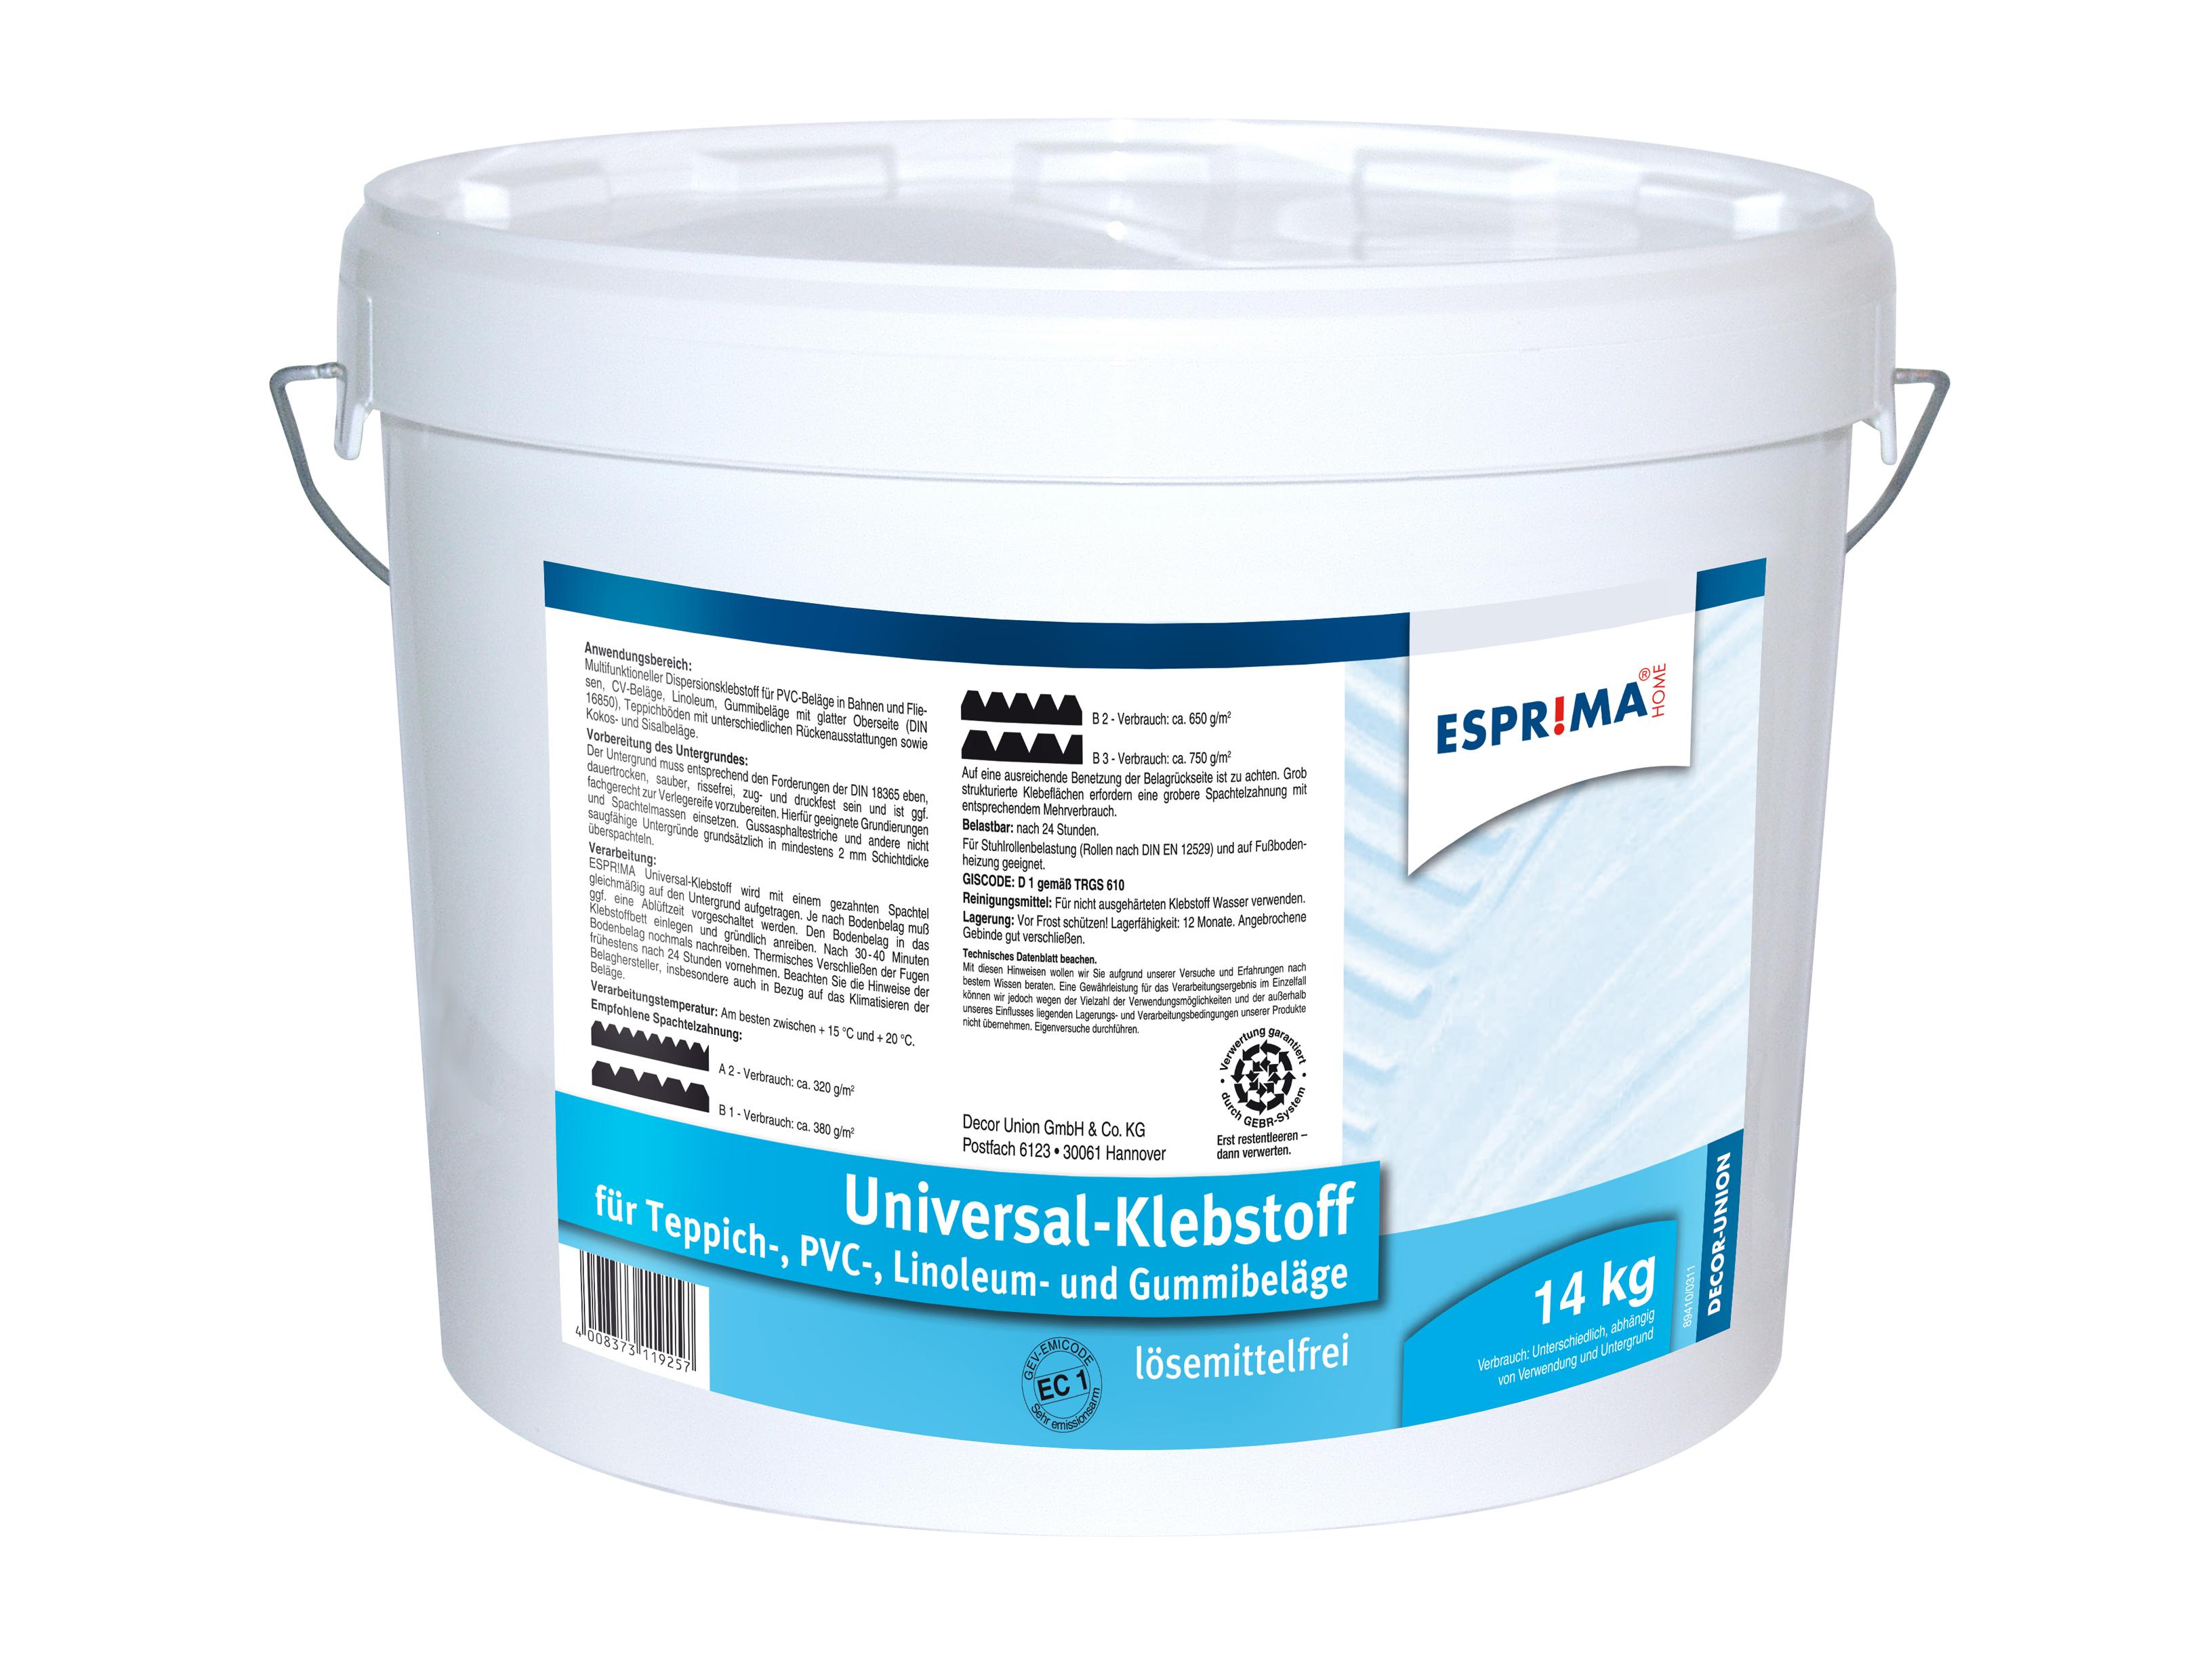 Bodenklebstoffe - Universal-Klebstoff